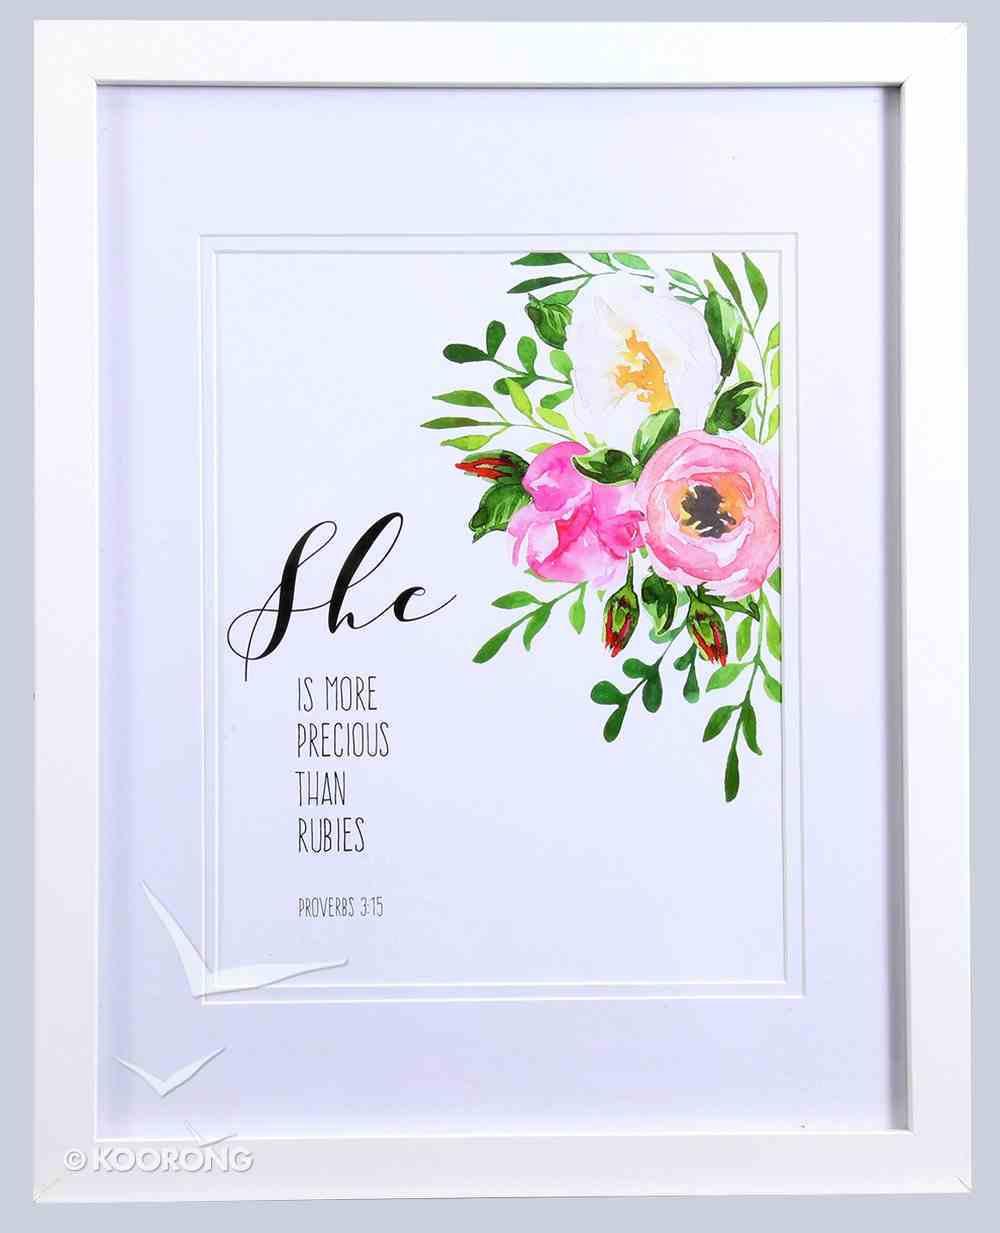 Medium Framed Print: Watercolour Flowers, She is More Precious Than Rubies (Proverbs 3:15) Plaque